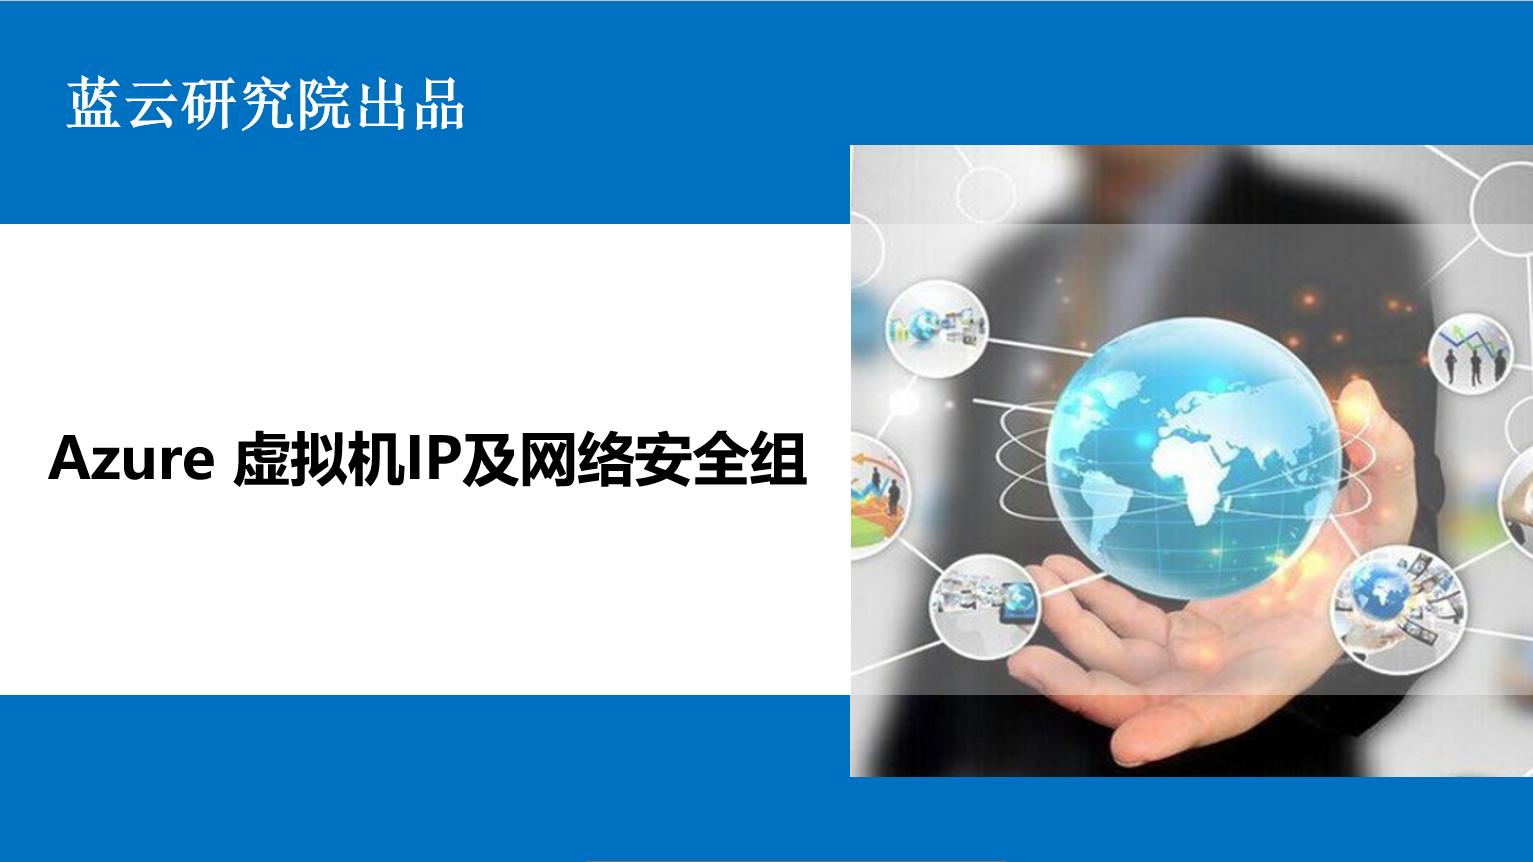 Azure虚拟机IP以及网络安全组